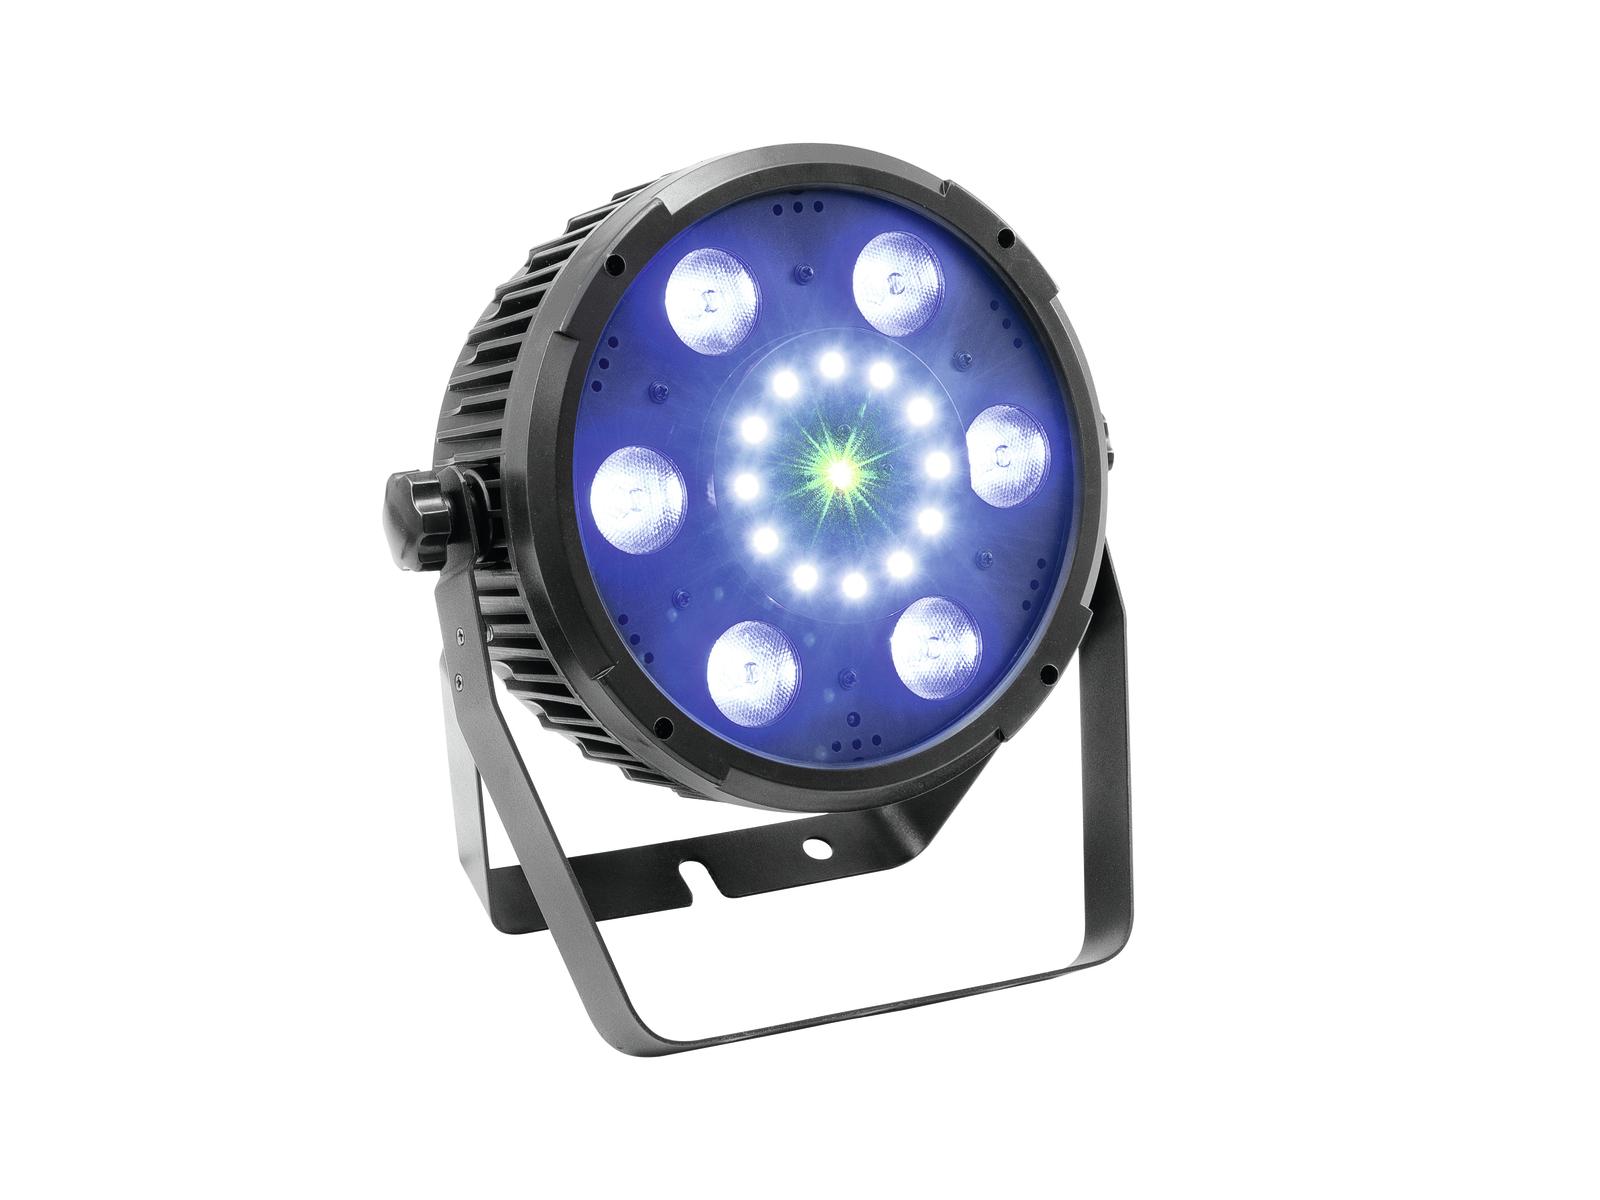 Eurolite LED PAR Slim FX, Strobo, RG Laser, DMX